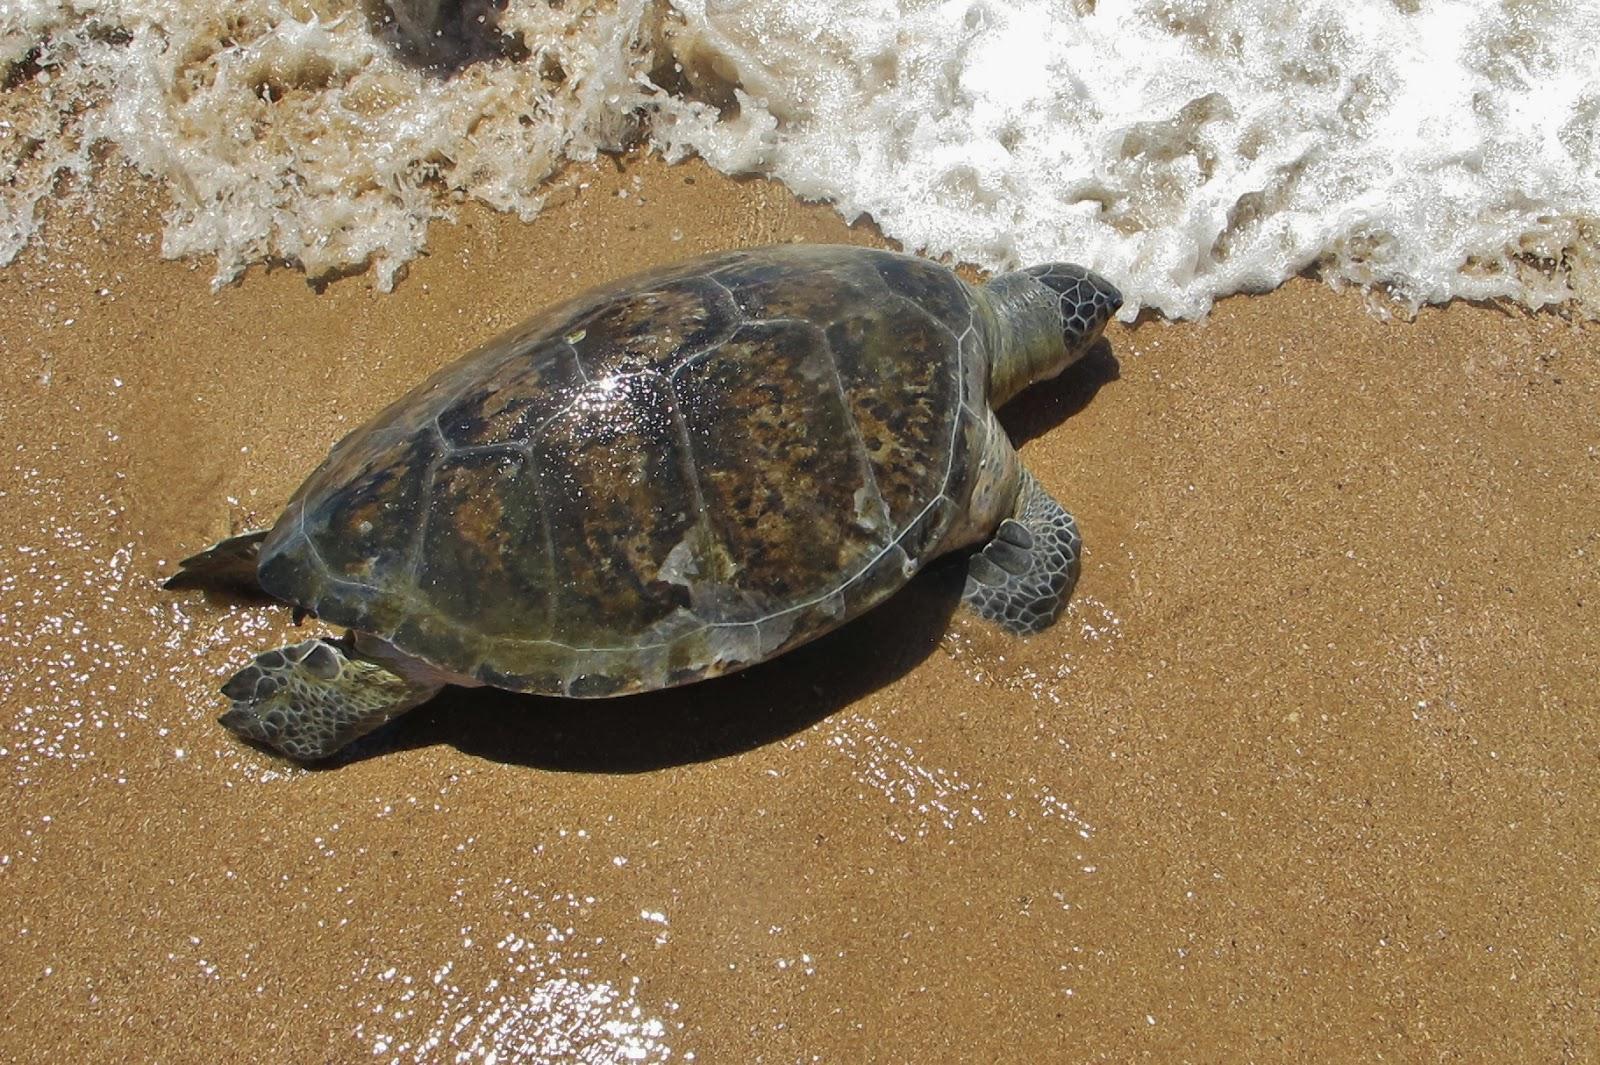 Tartaruga na Praia Vermelha, em Penha, no litoral catarinense.